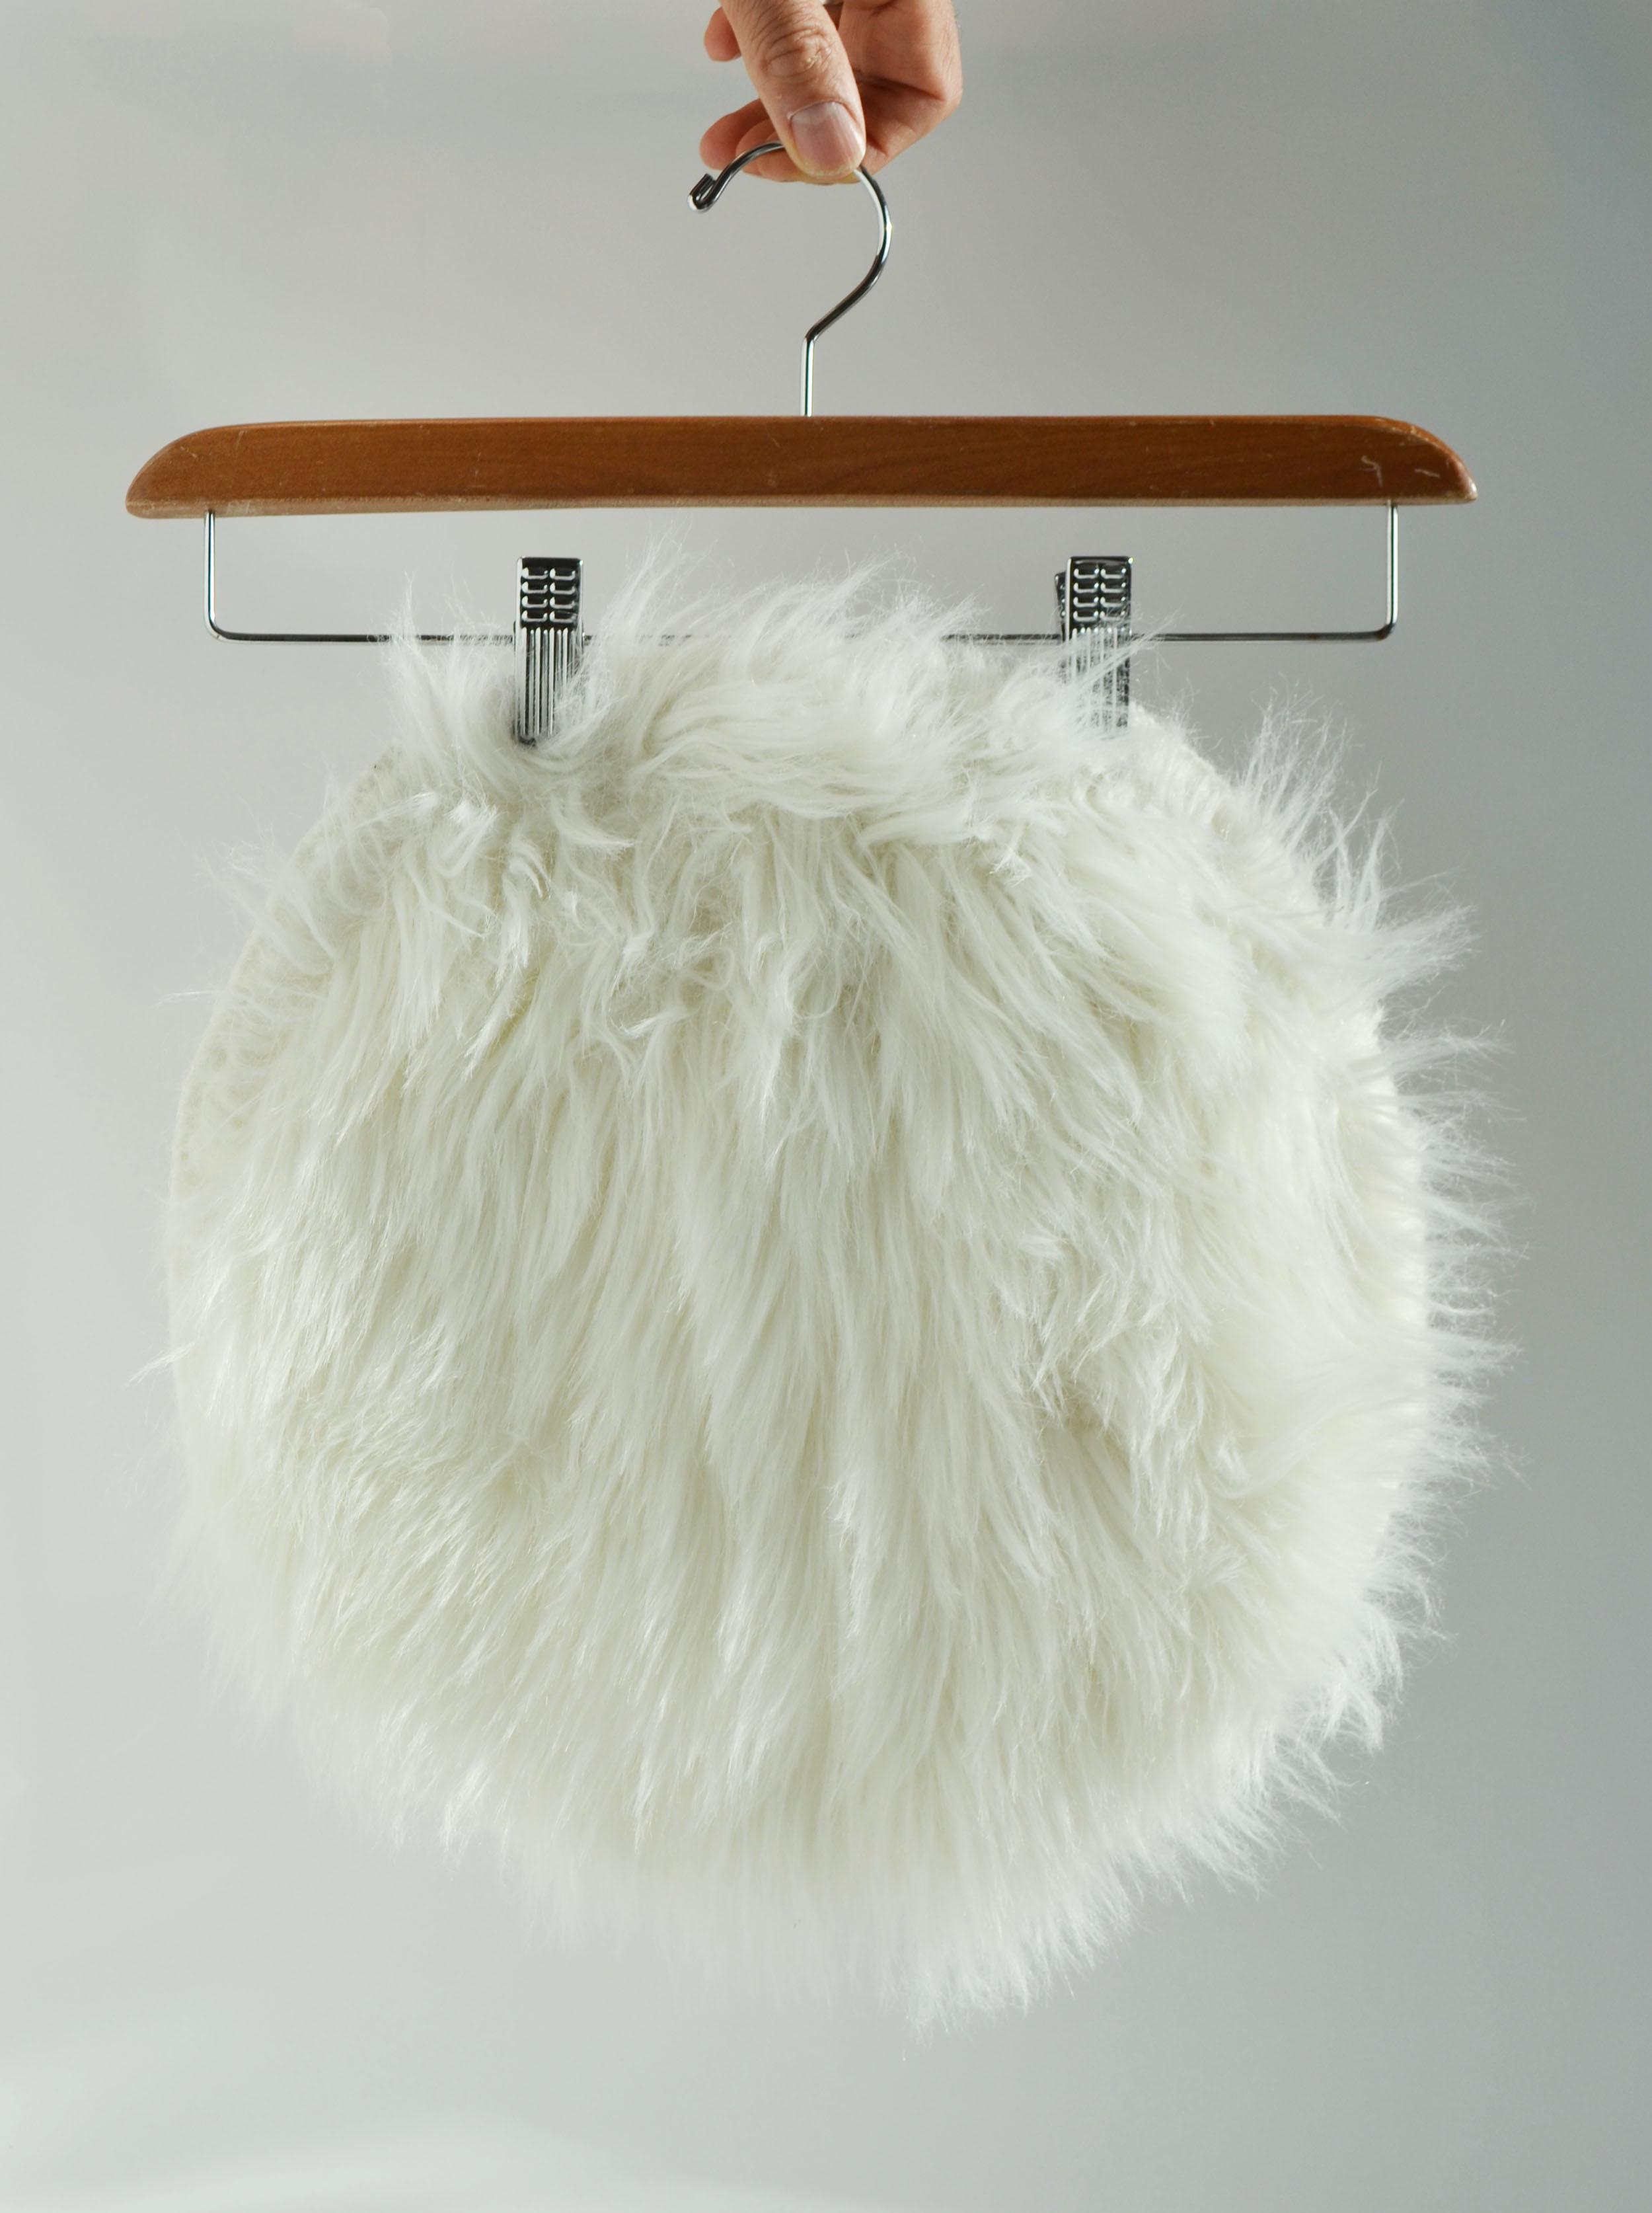 faux-fur stool cover - white   Quantity: 1  Price: $3.50